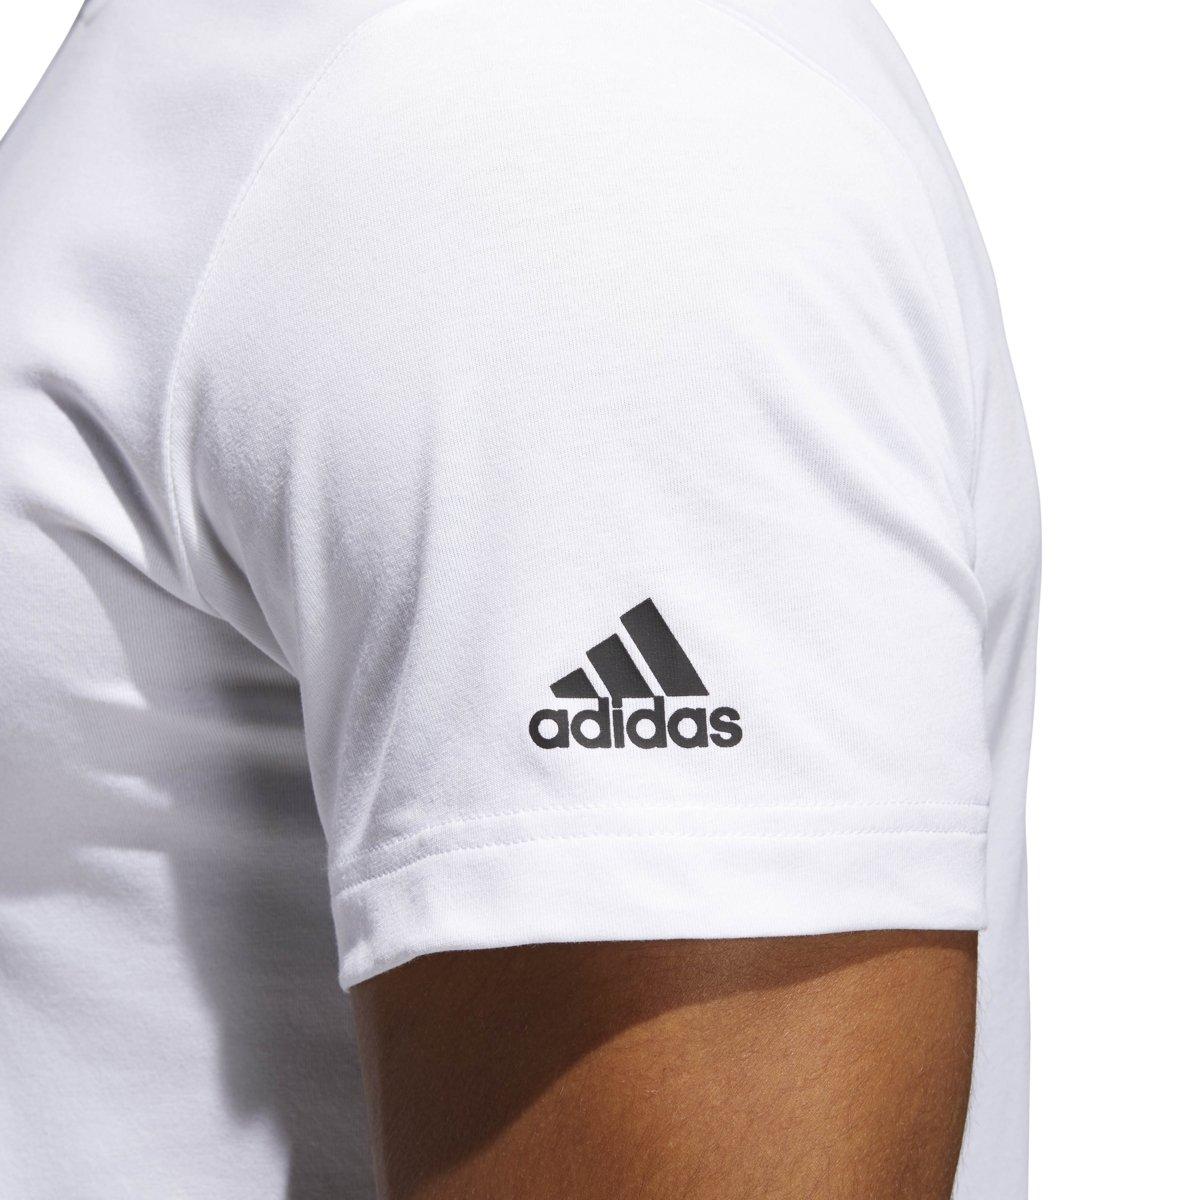 4817fa8d6 Amazon.com  adidas Men s Harden Shadow Tee White Medium  Sports   Outdoors